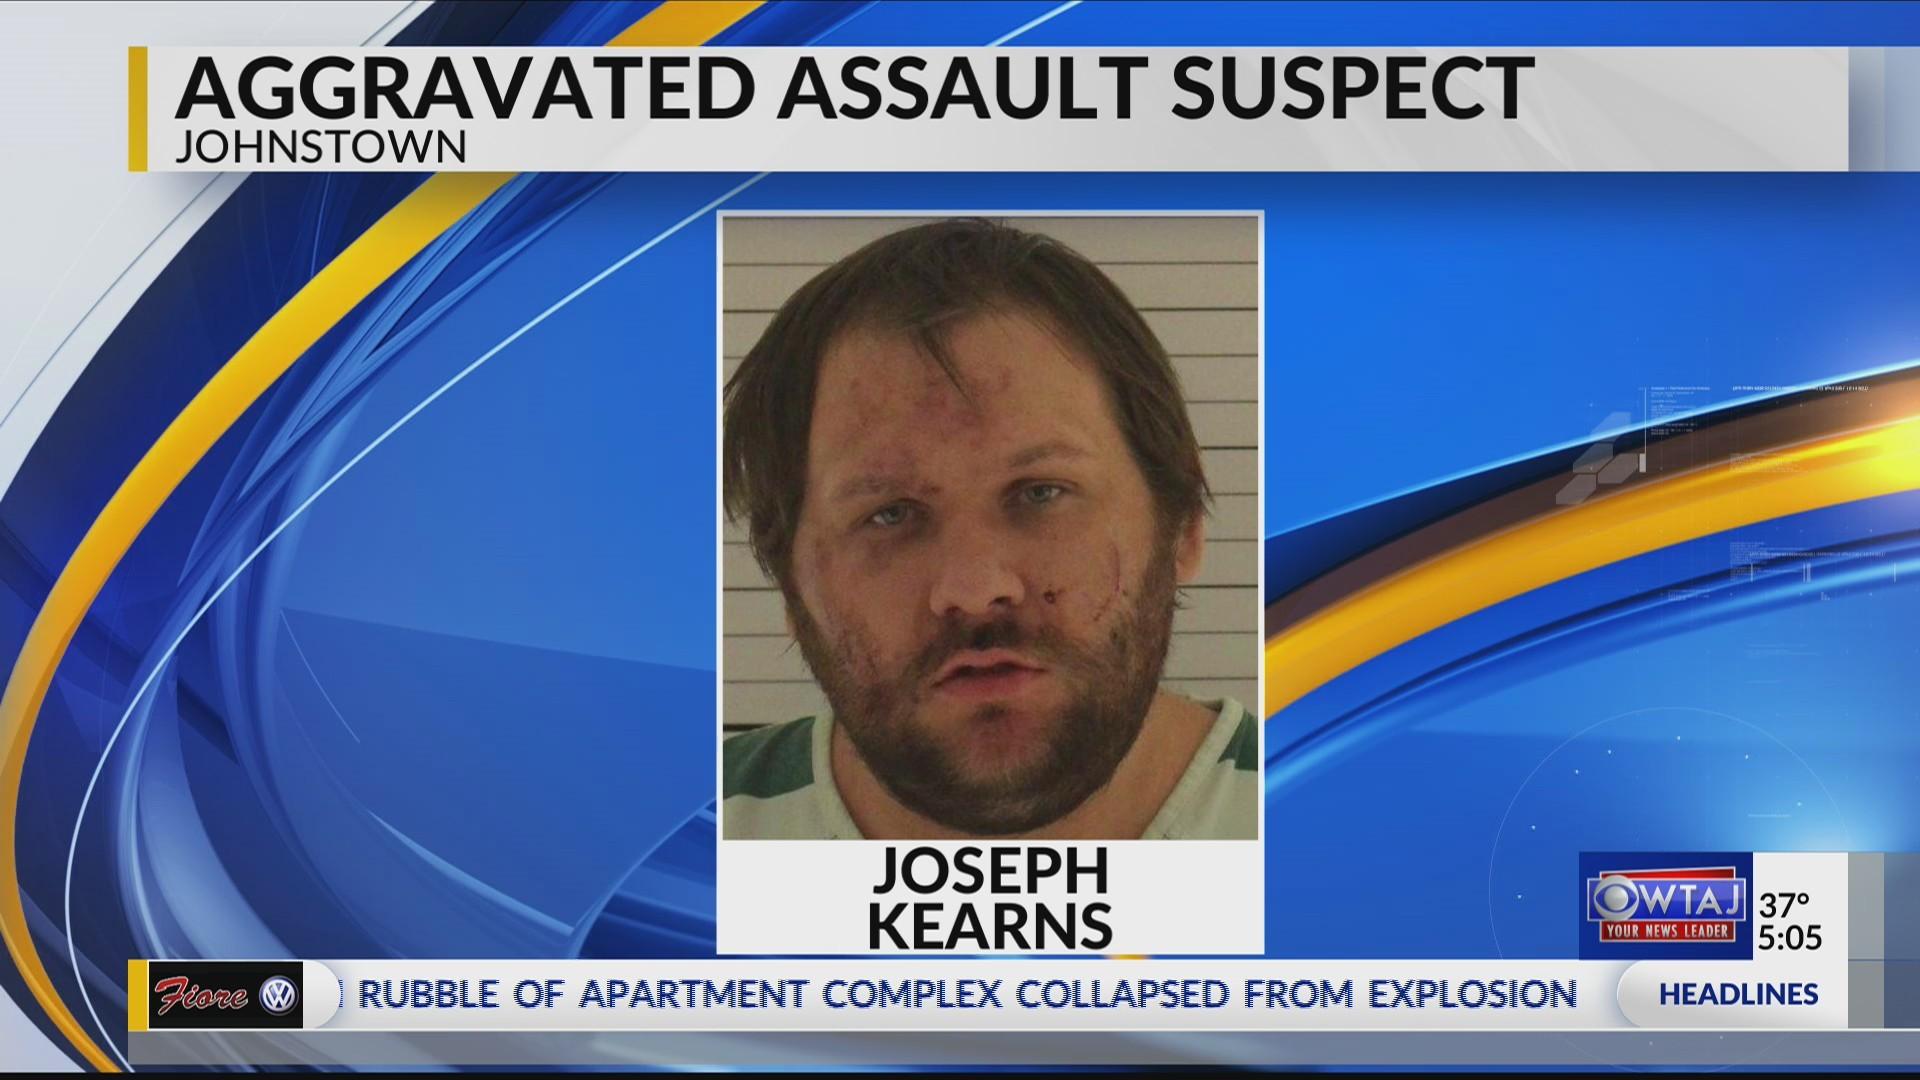 Aggravated Assault suspect